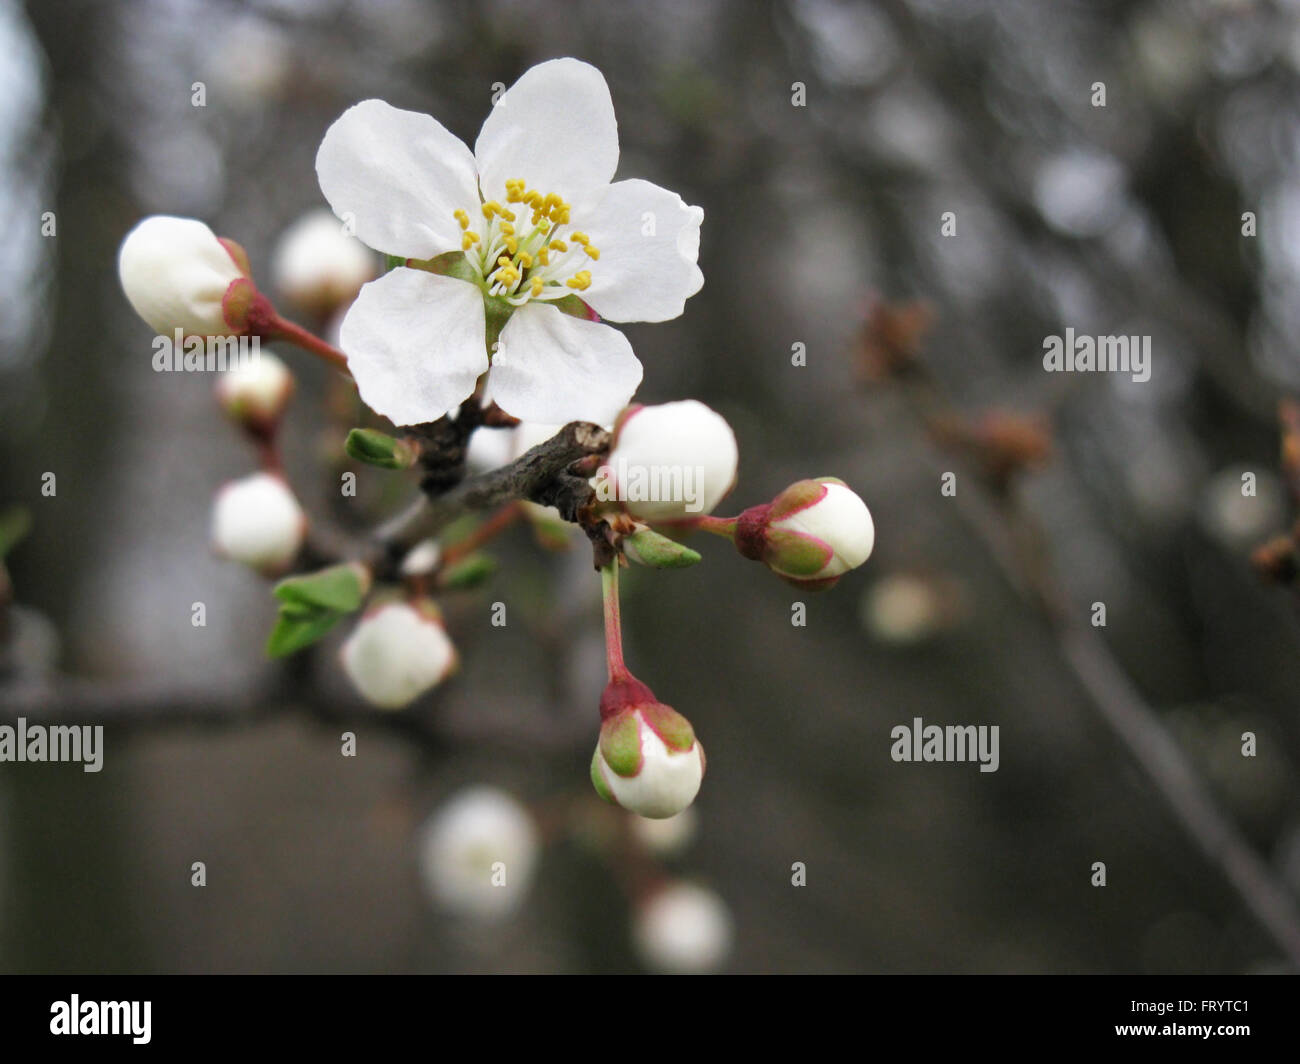 Obst-Blüten im Frühjahr. Stockbild